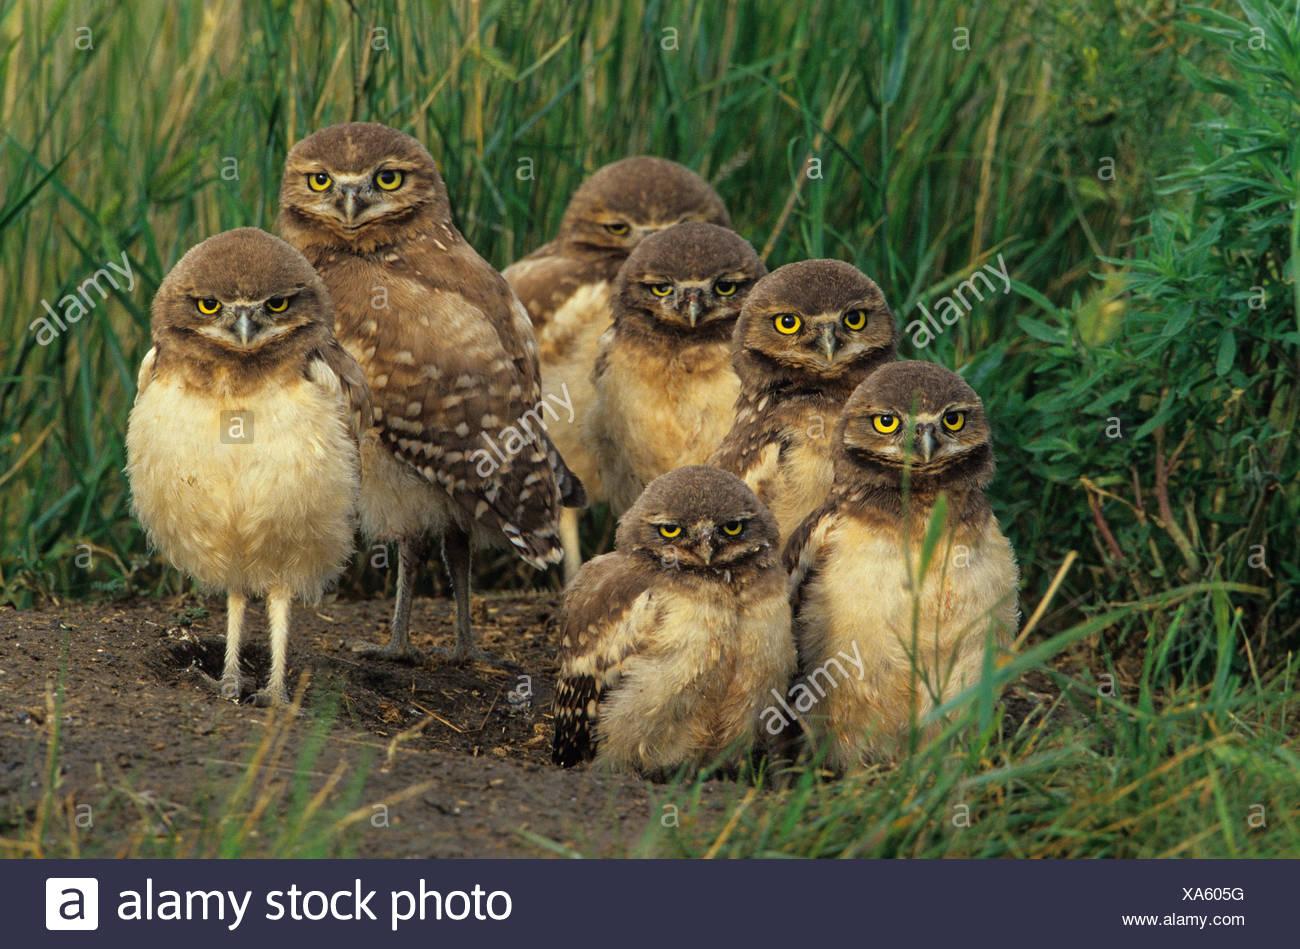 Burrowing owl (Athene cunicularia) chicks at nest burrow near Grasslands National Park, Saskatchewan, Canada - Stock Image